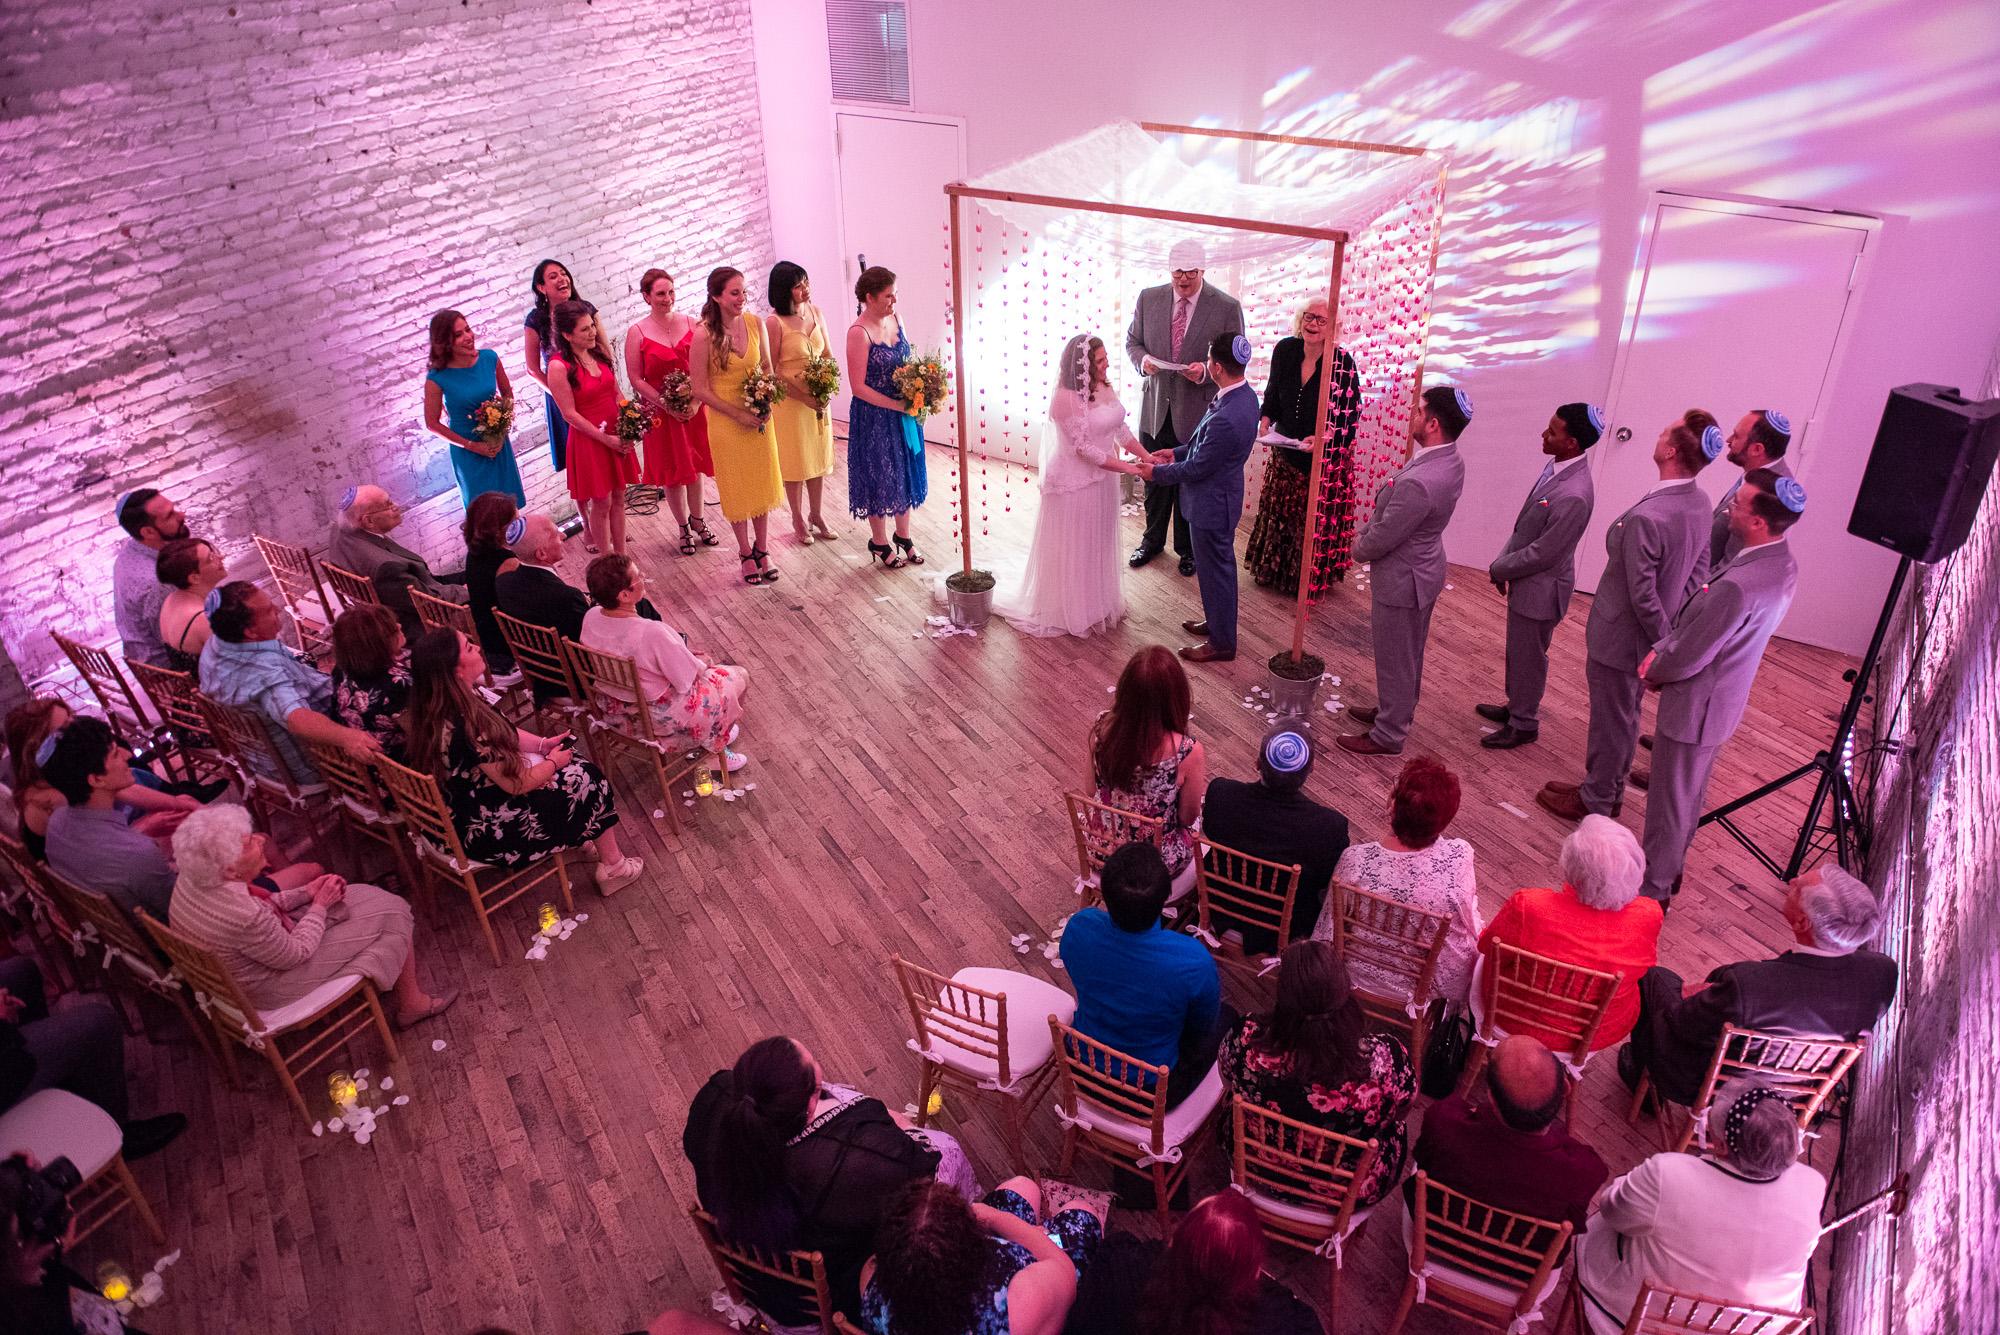 180617_events_wedding_rachel_chuck_044.jpg